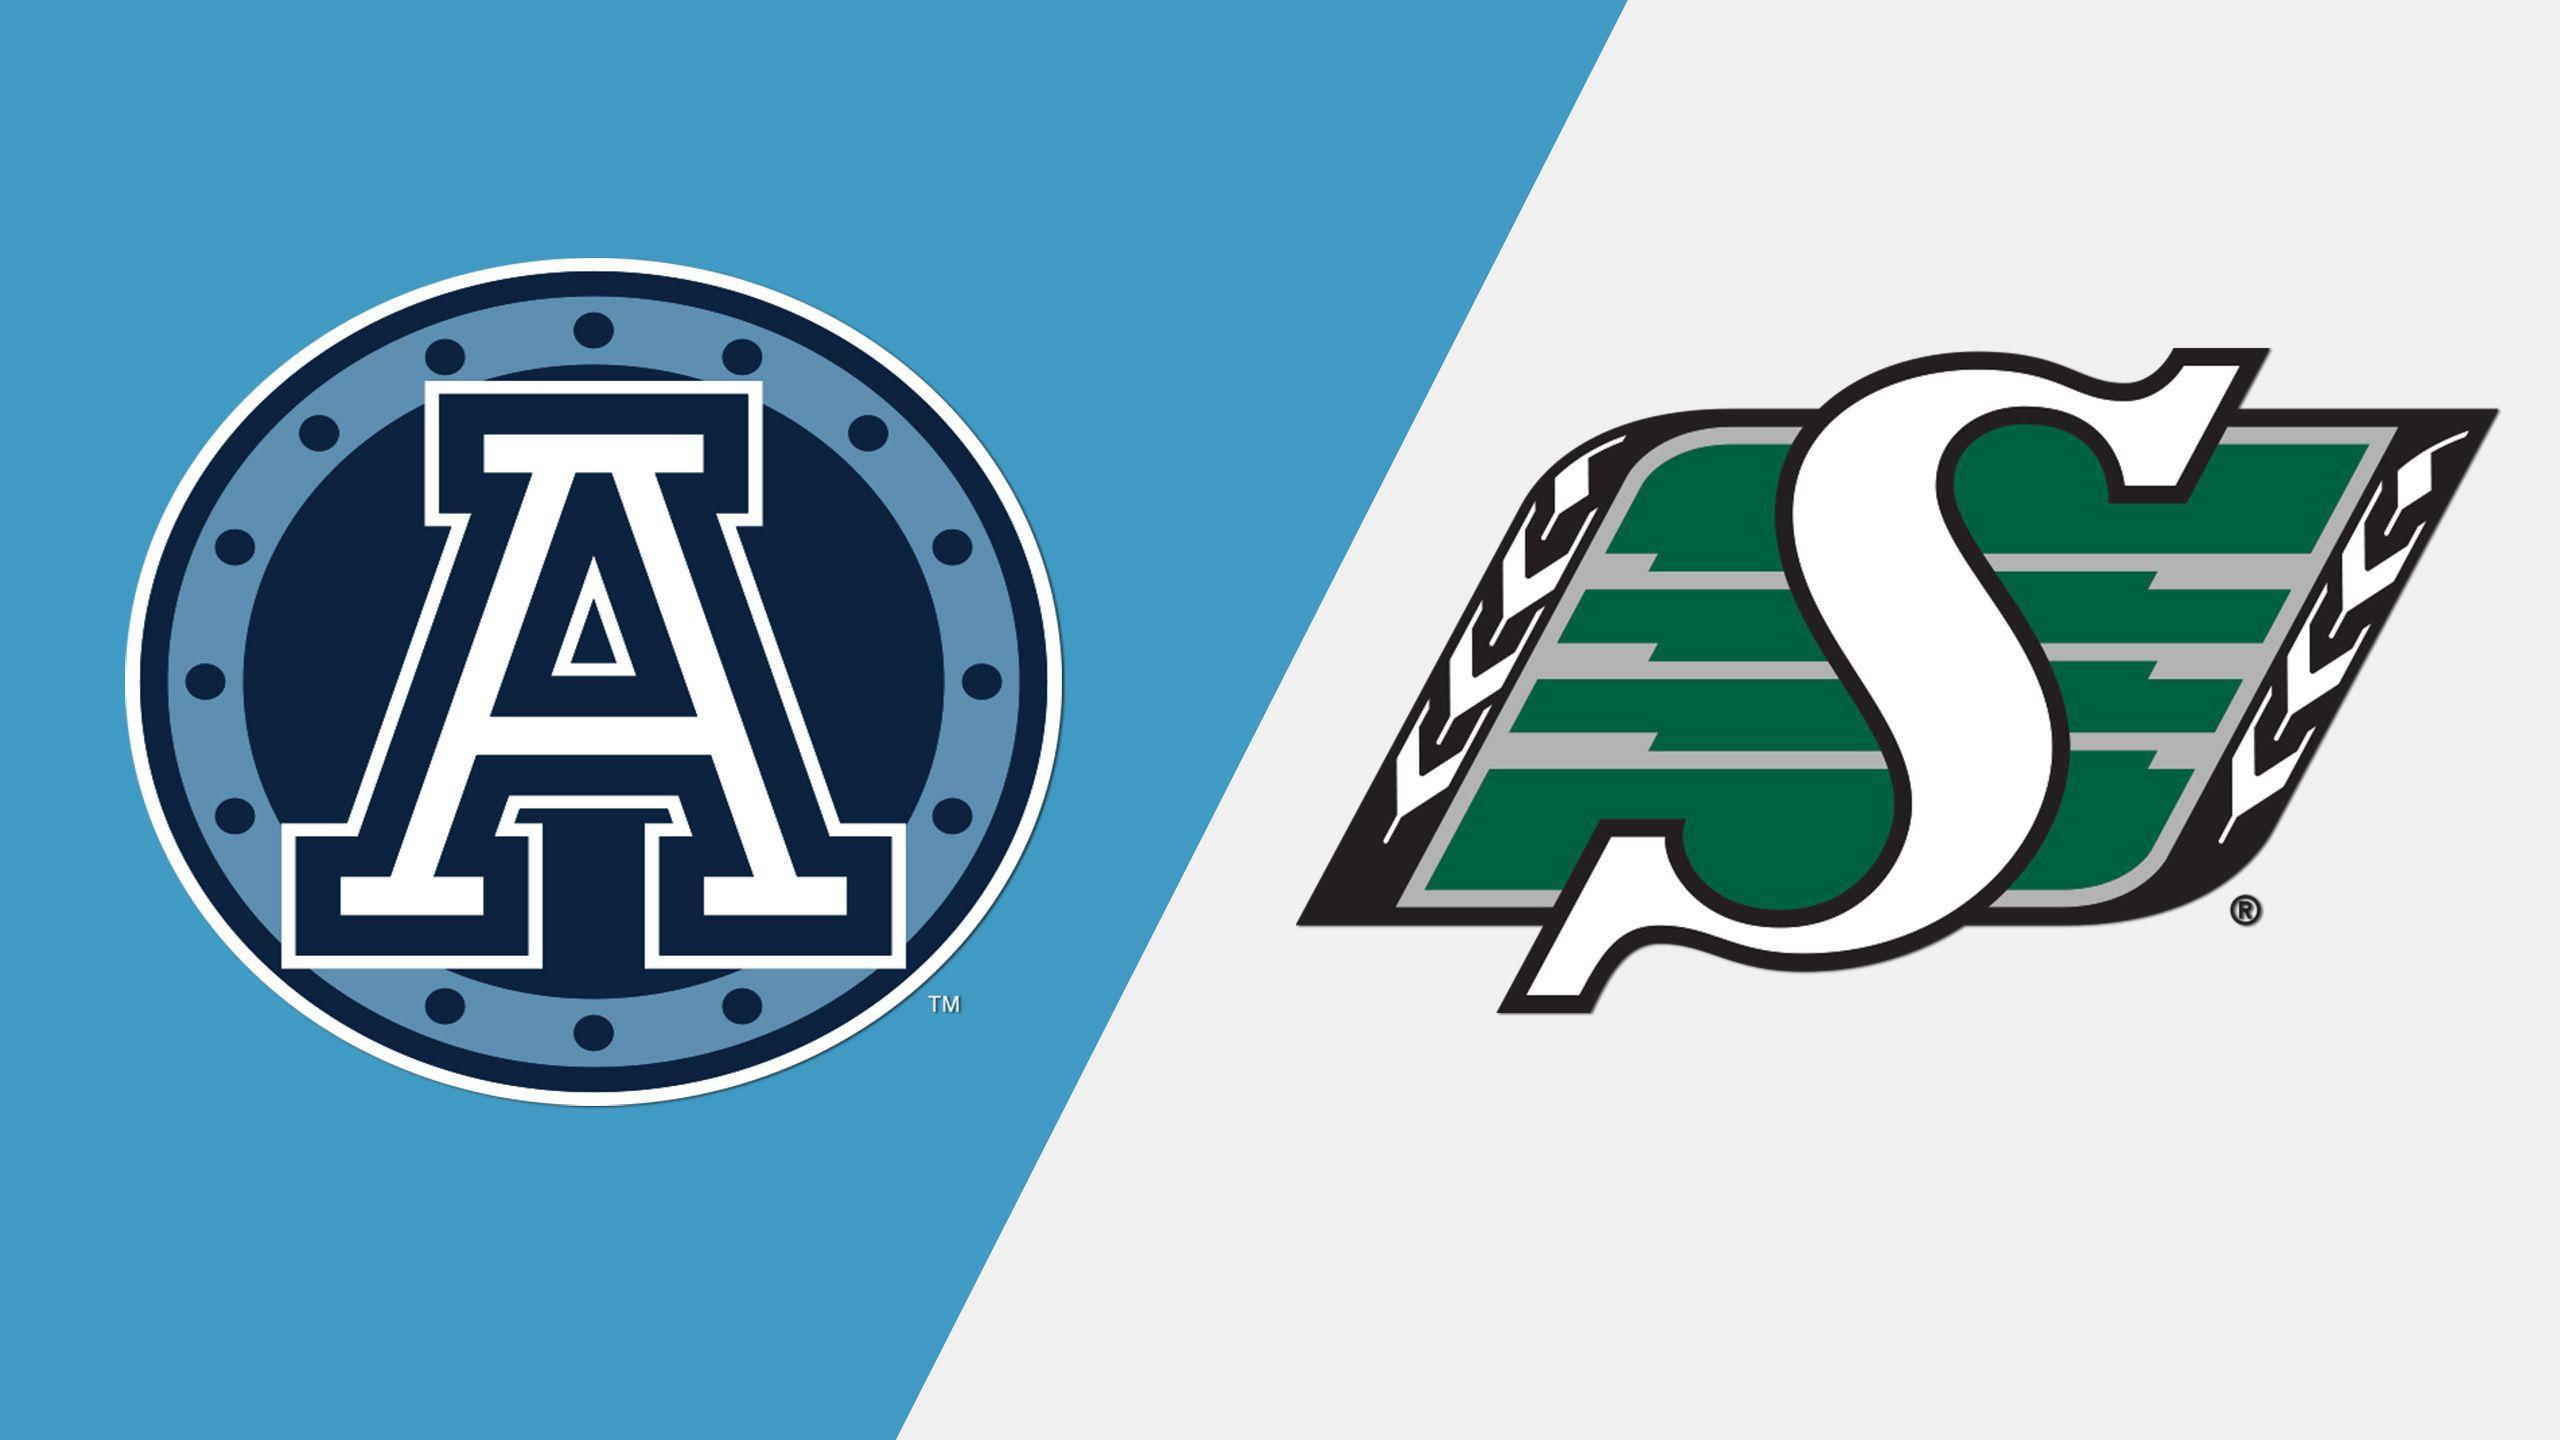 Toronto Argonauts vs. Saskatchewan Roughriders